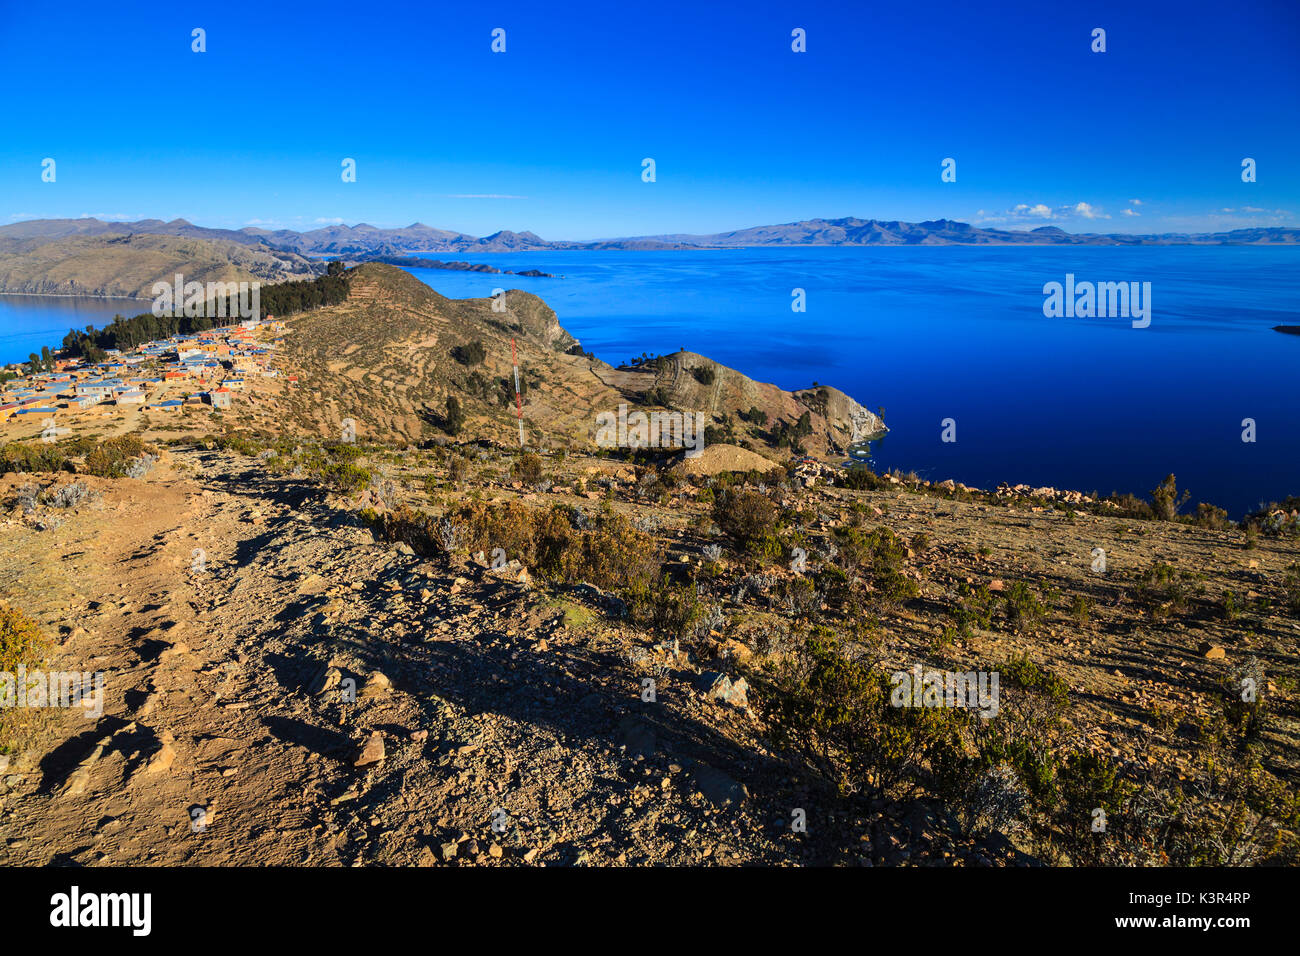 Isla del Sol on the Bolivian Side of Lake Titicaca, Bolivia, South America - Stock Image